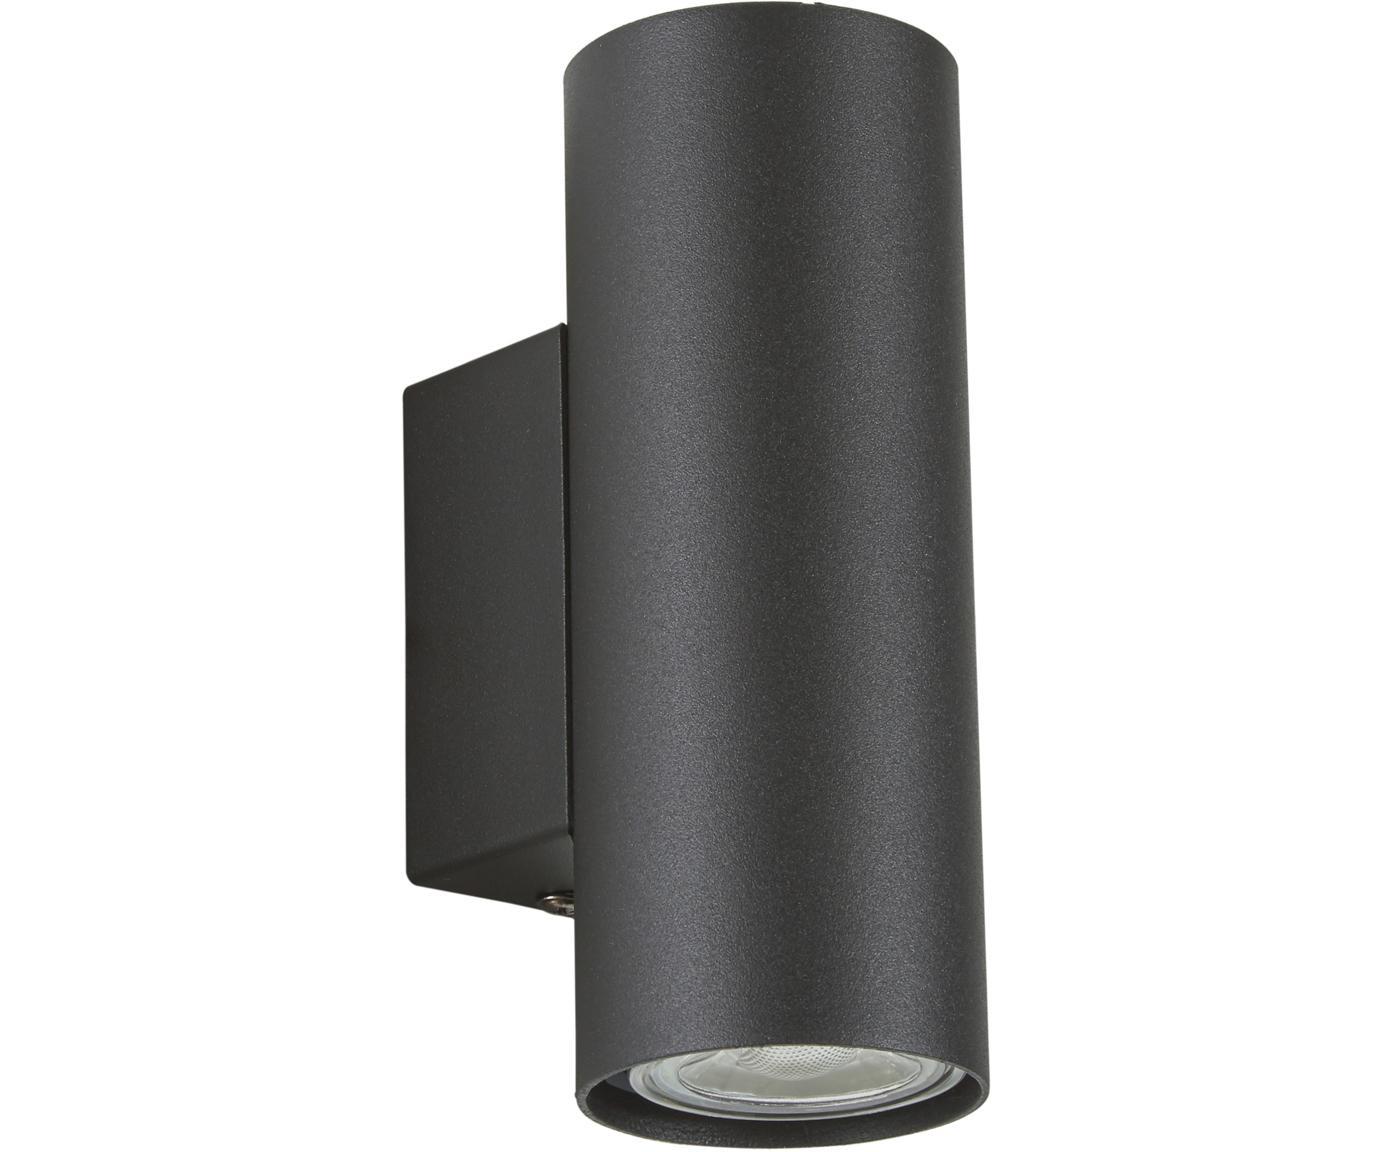 Aplique LED  Paul, Metal, pintado en polvo, Negro, An 6 x Al 9 cm